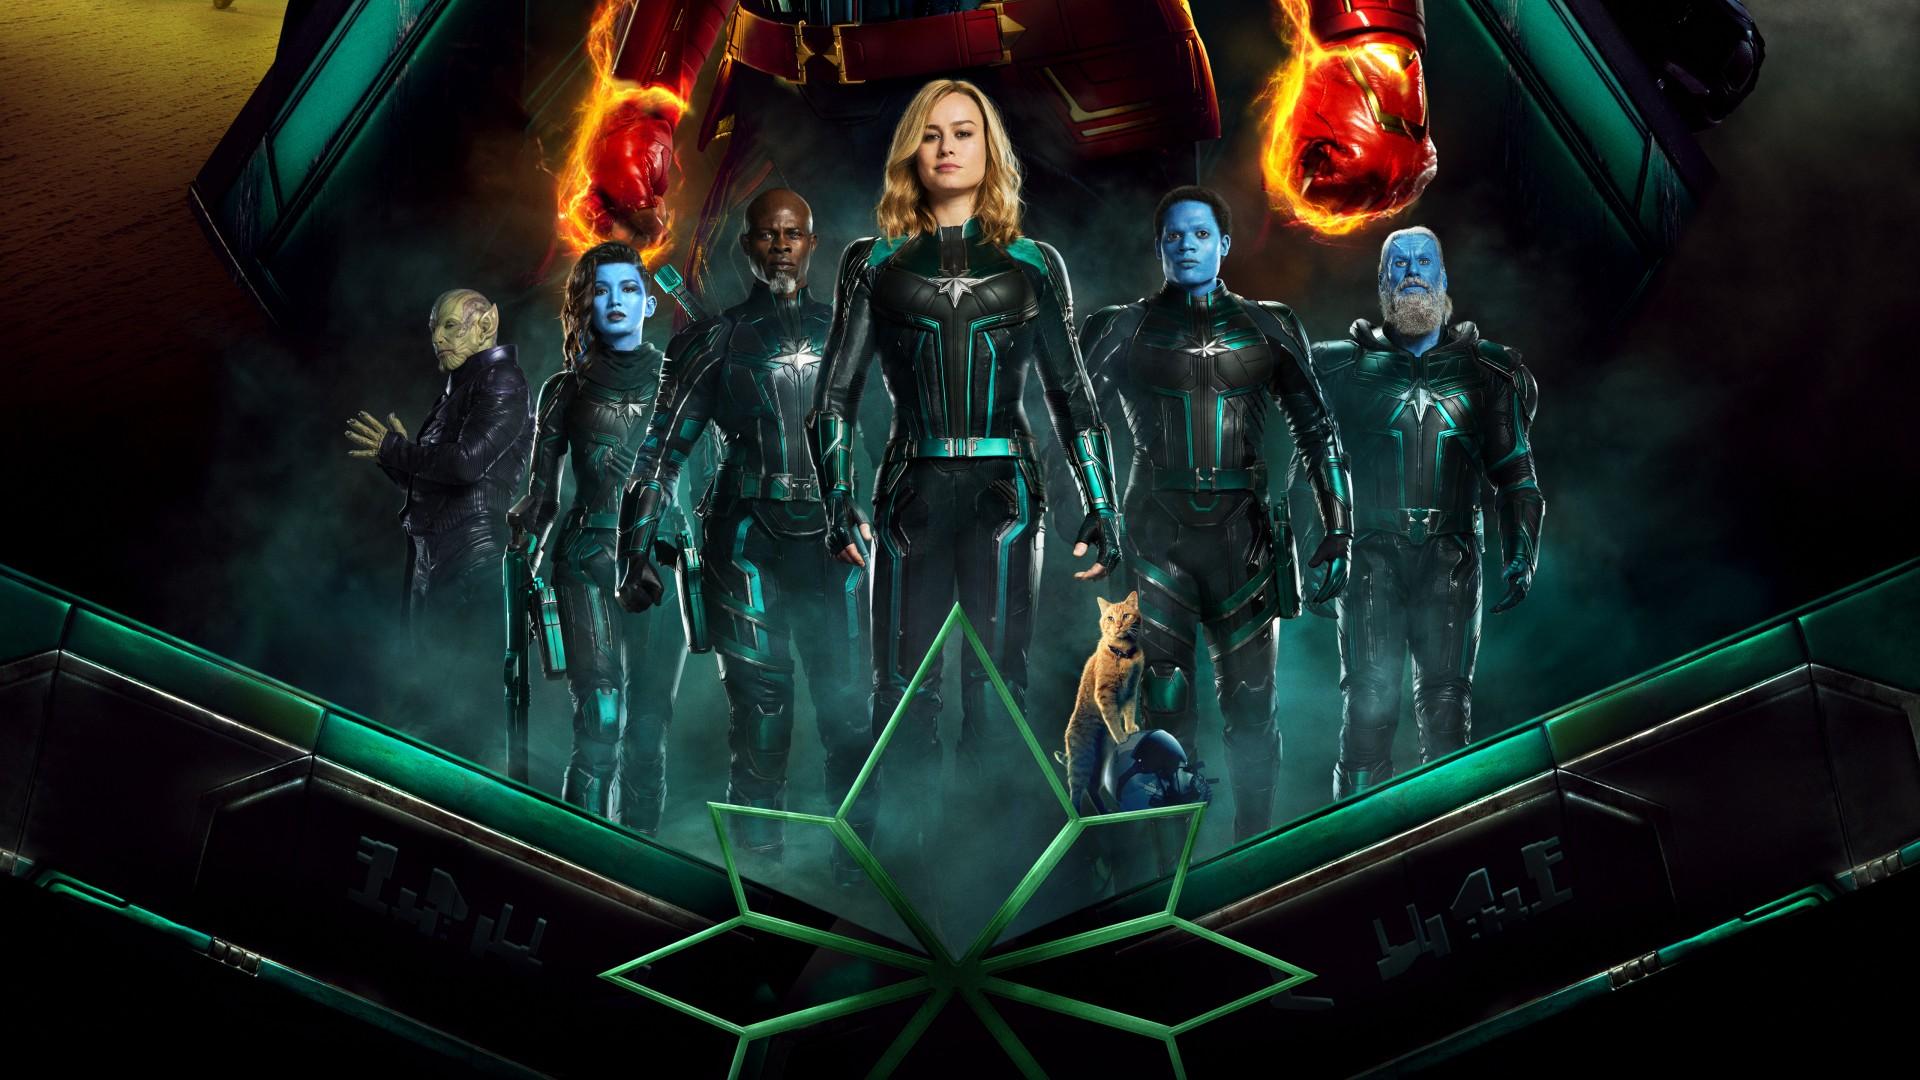 Deadpool Hd Wallpaper Iphone 6 Captain Marvel Kree Team 4k 5k Wallpapers Hd Wallpapers